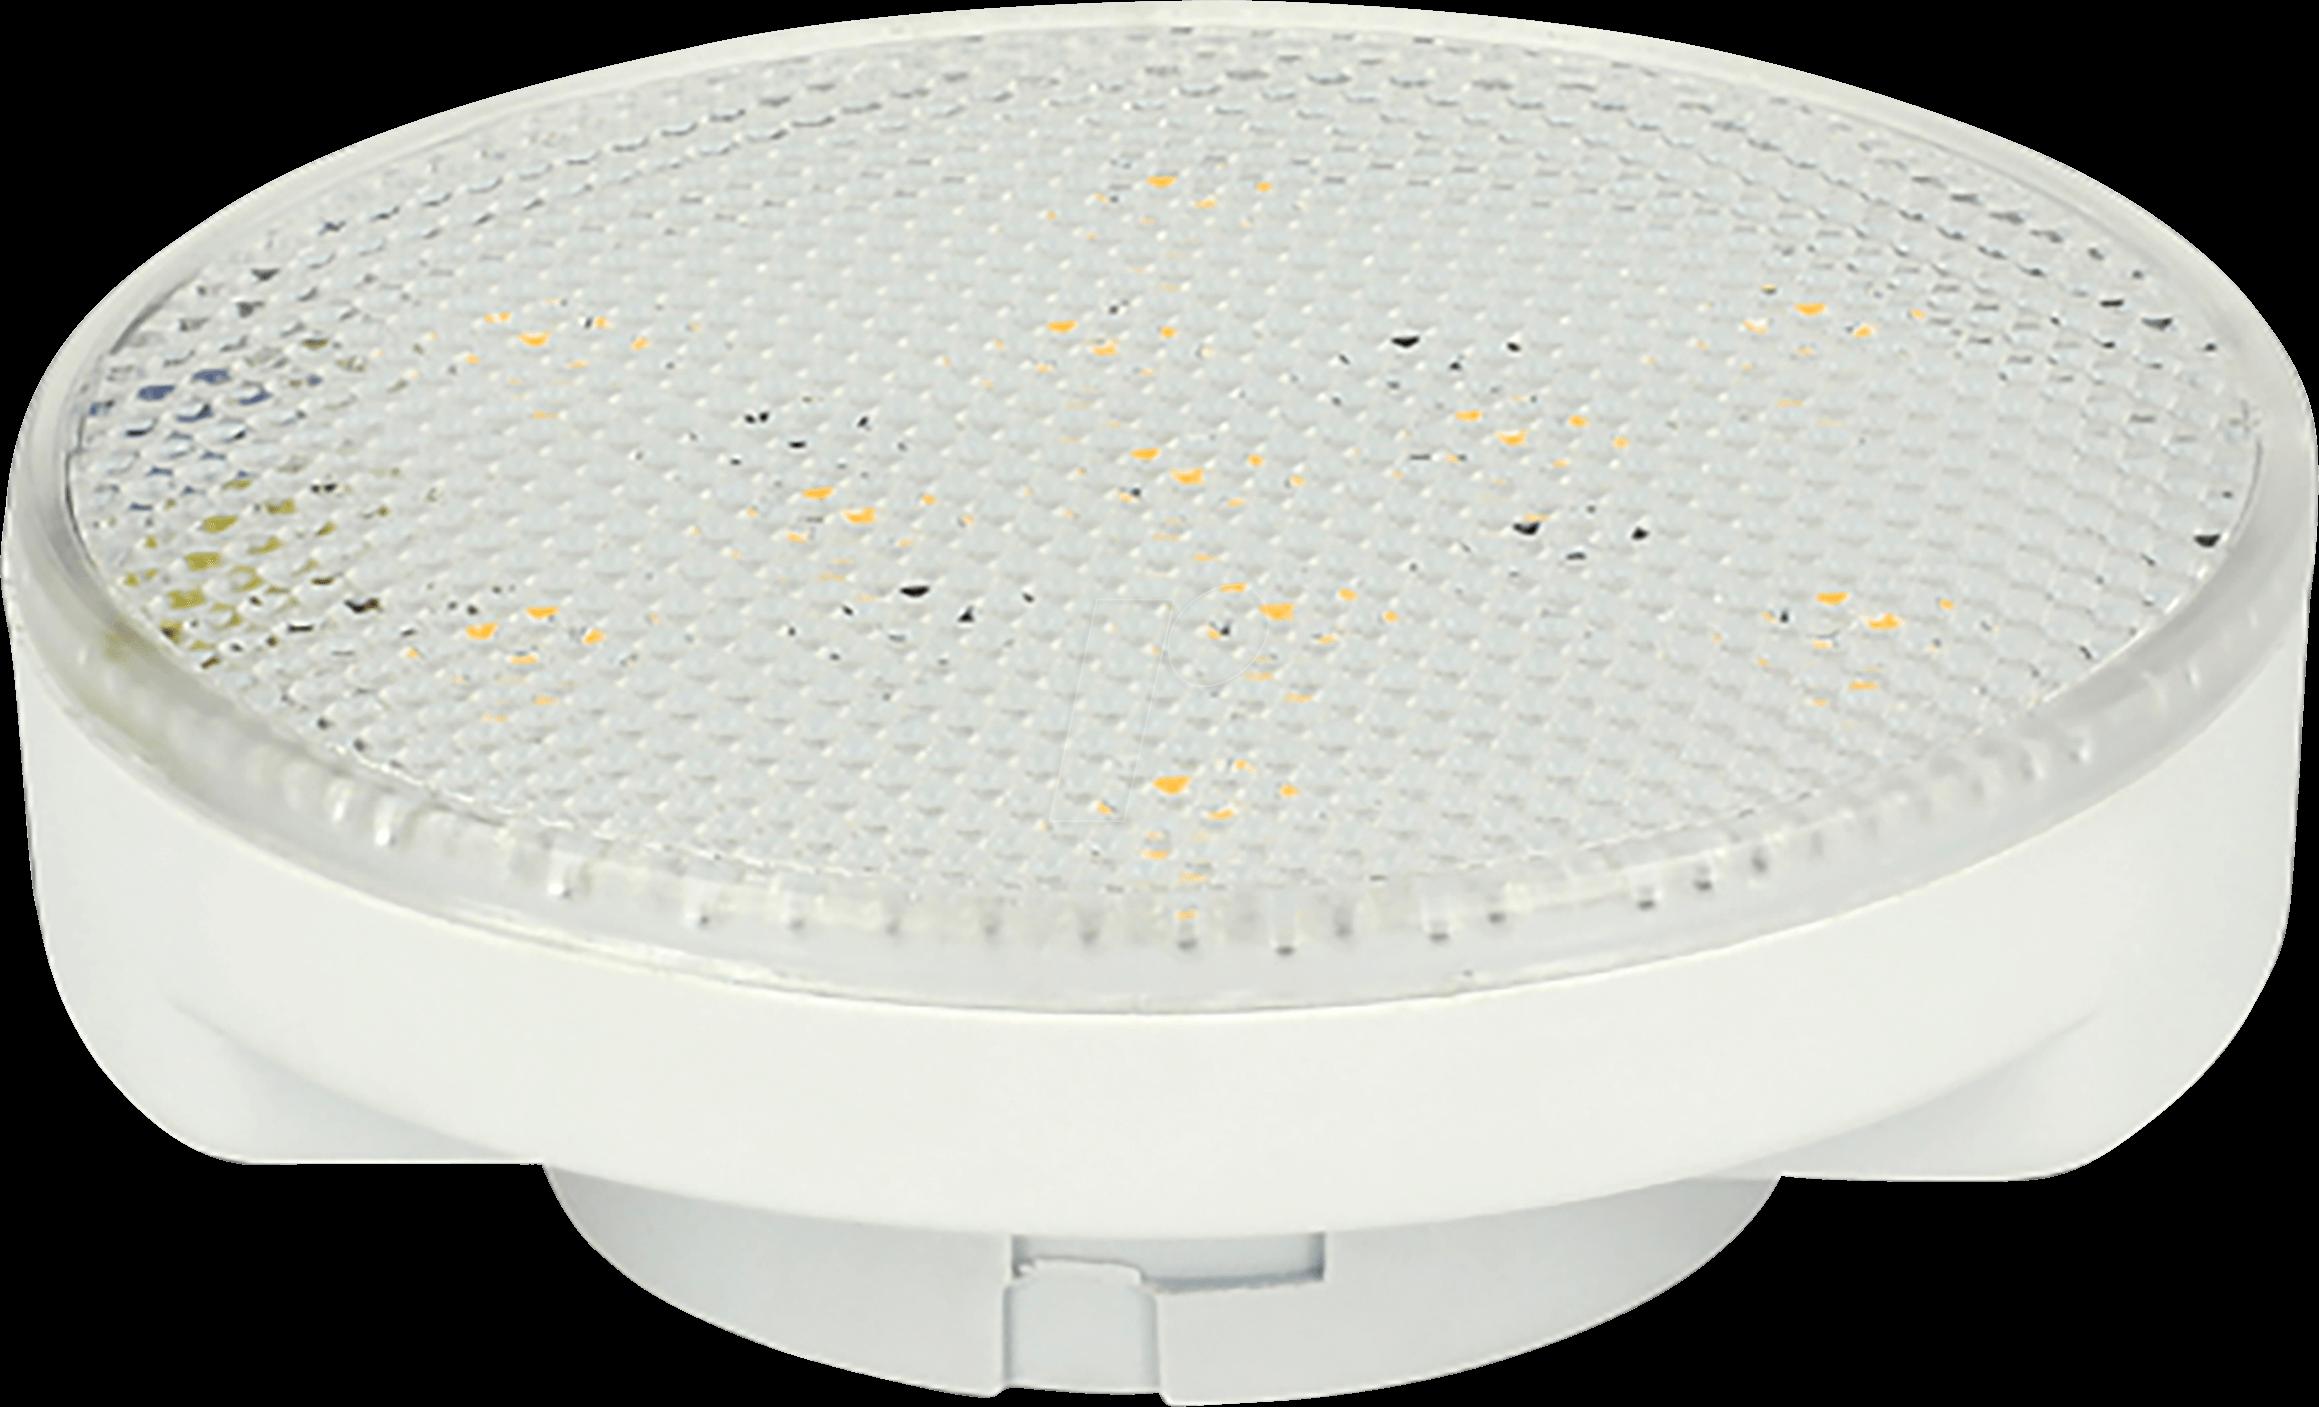 delock 46383 gx53 led illuminant 5 0 w warm white 11 x smd at reichelt elektronik. Black Bedroom Furniture Sets. Home Design Ideas